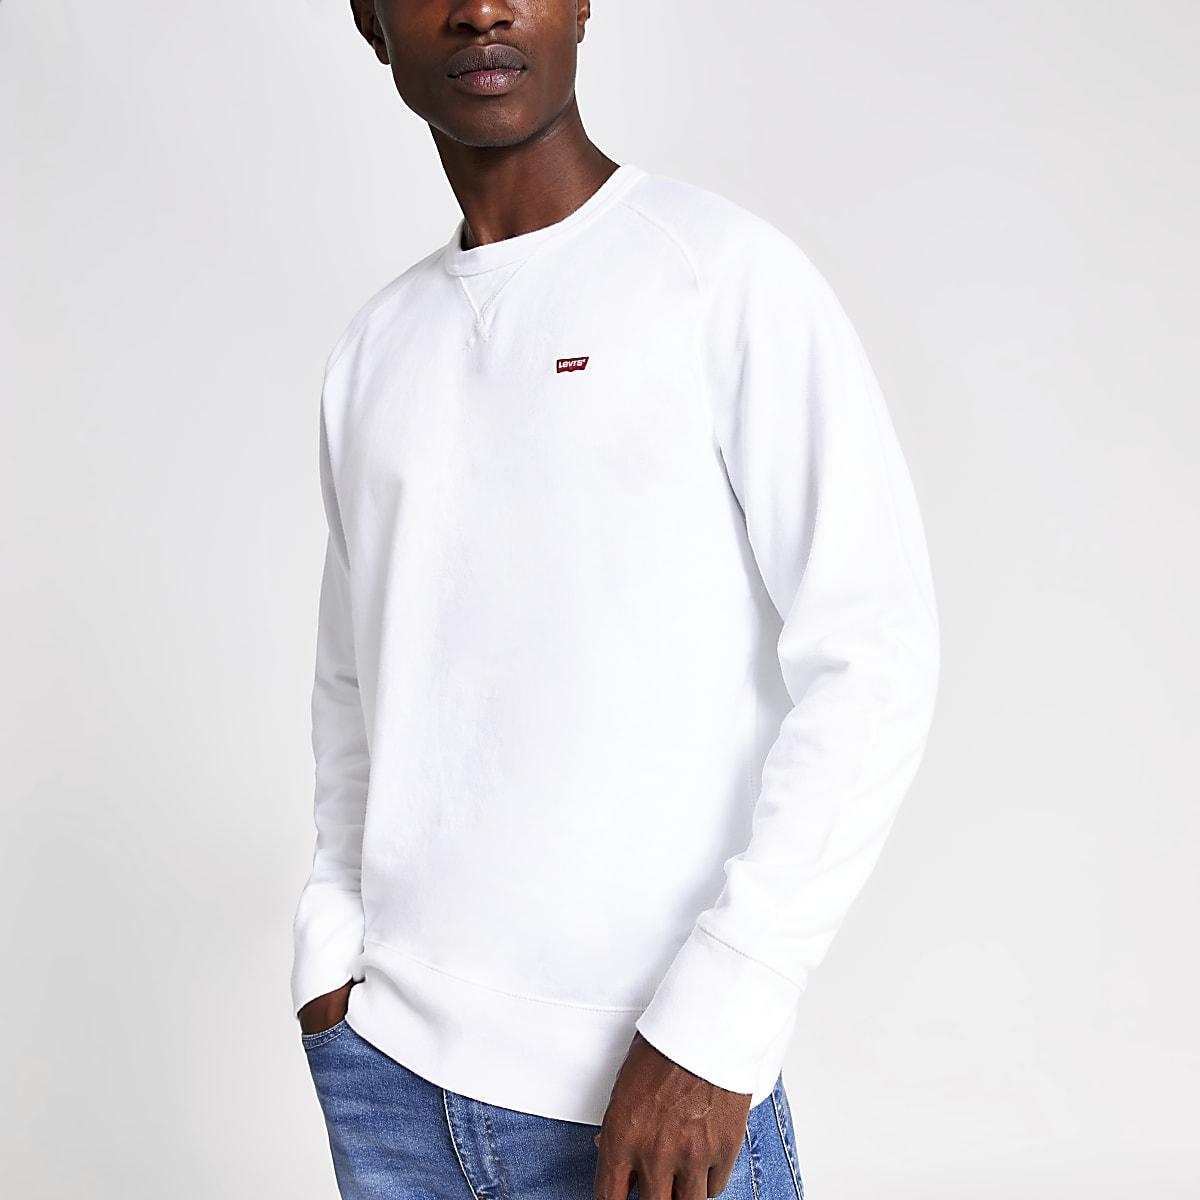 Levi's Original white sweatshirt